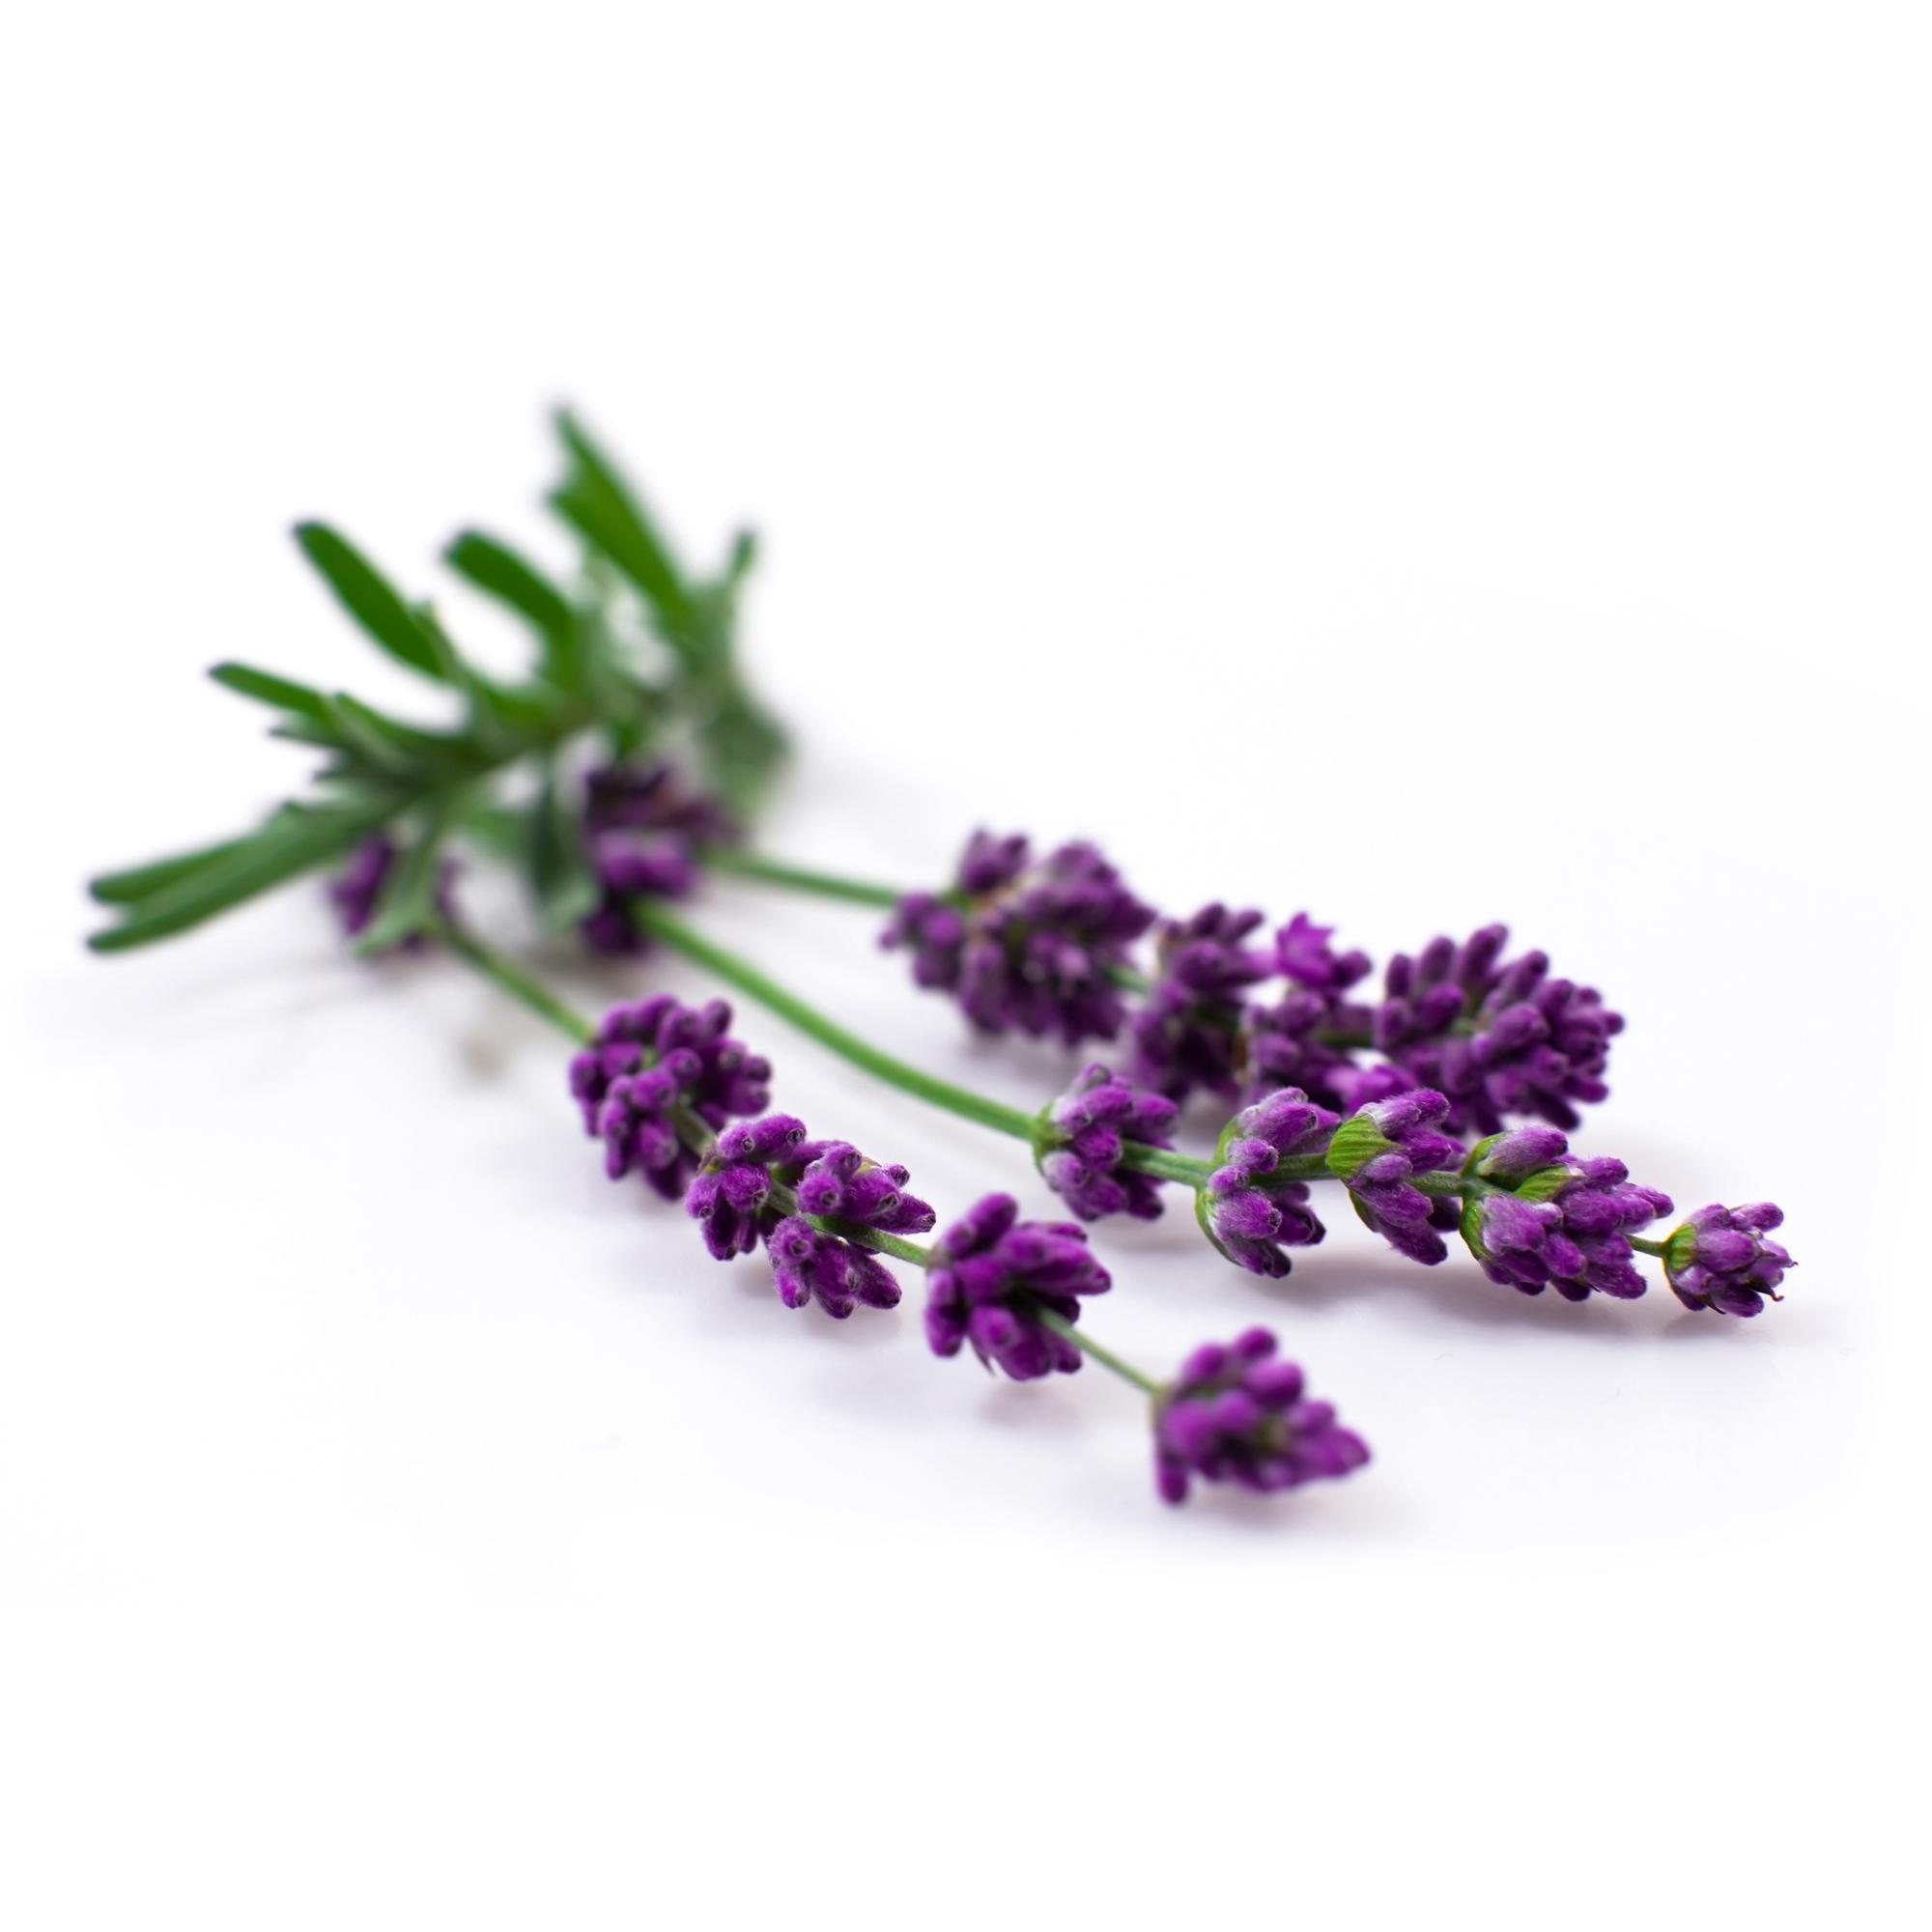 Bio Yoga mat cleaner - fresh lavender - 10 l